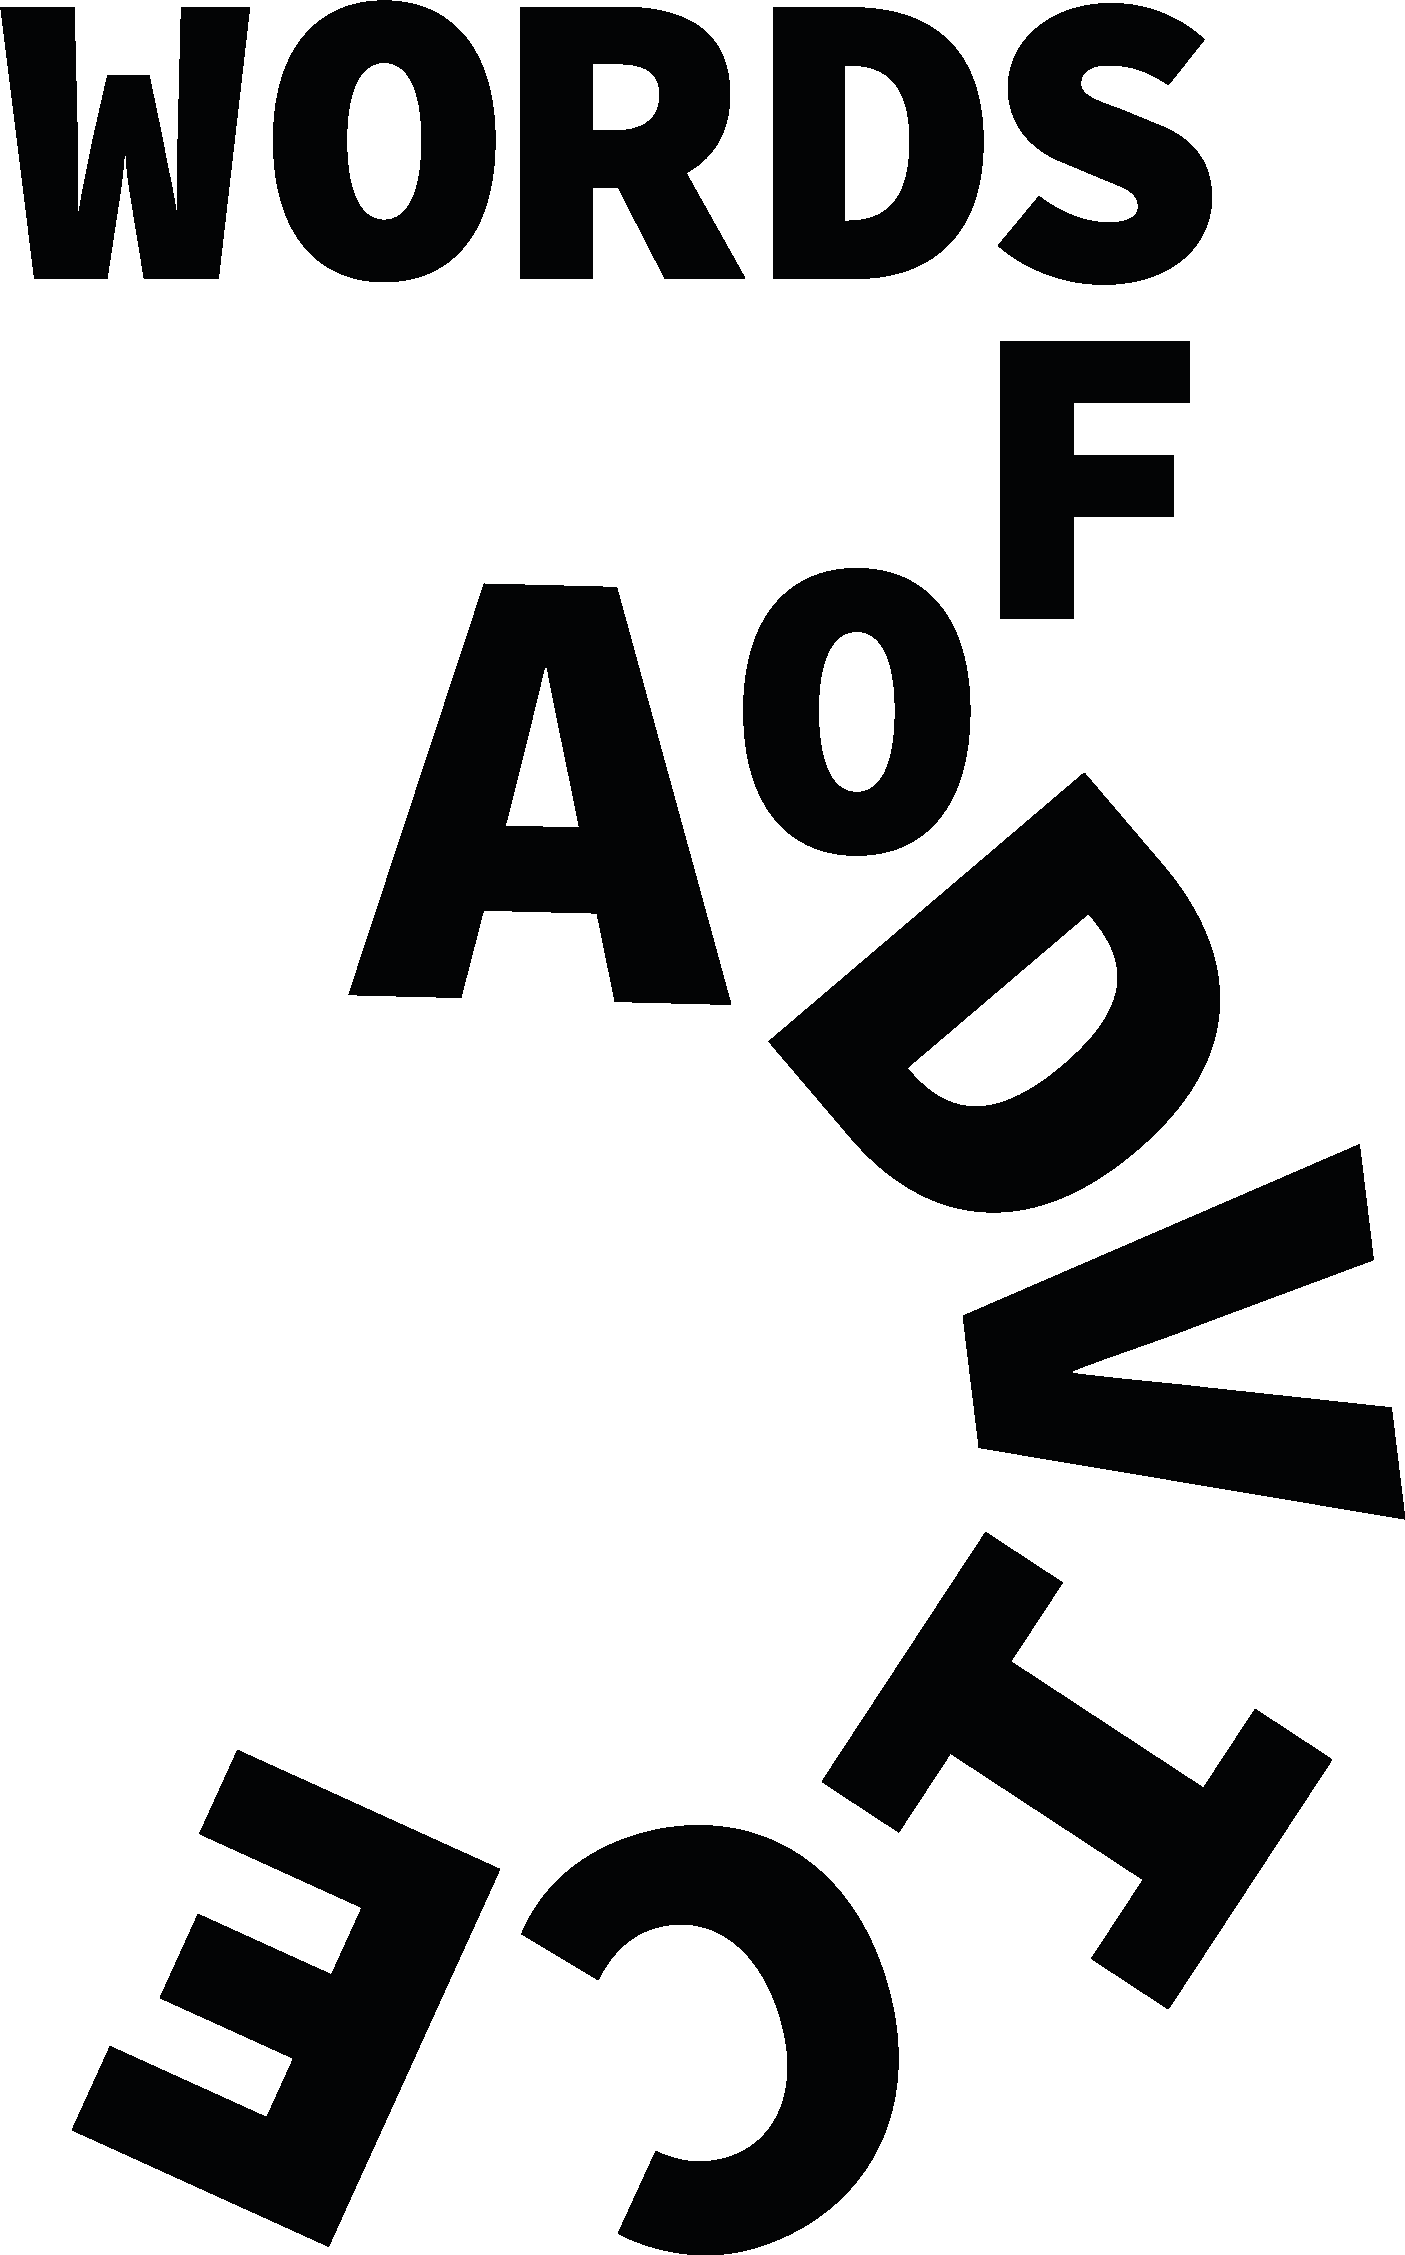 3 words of Advice logo